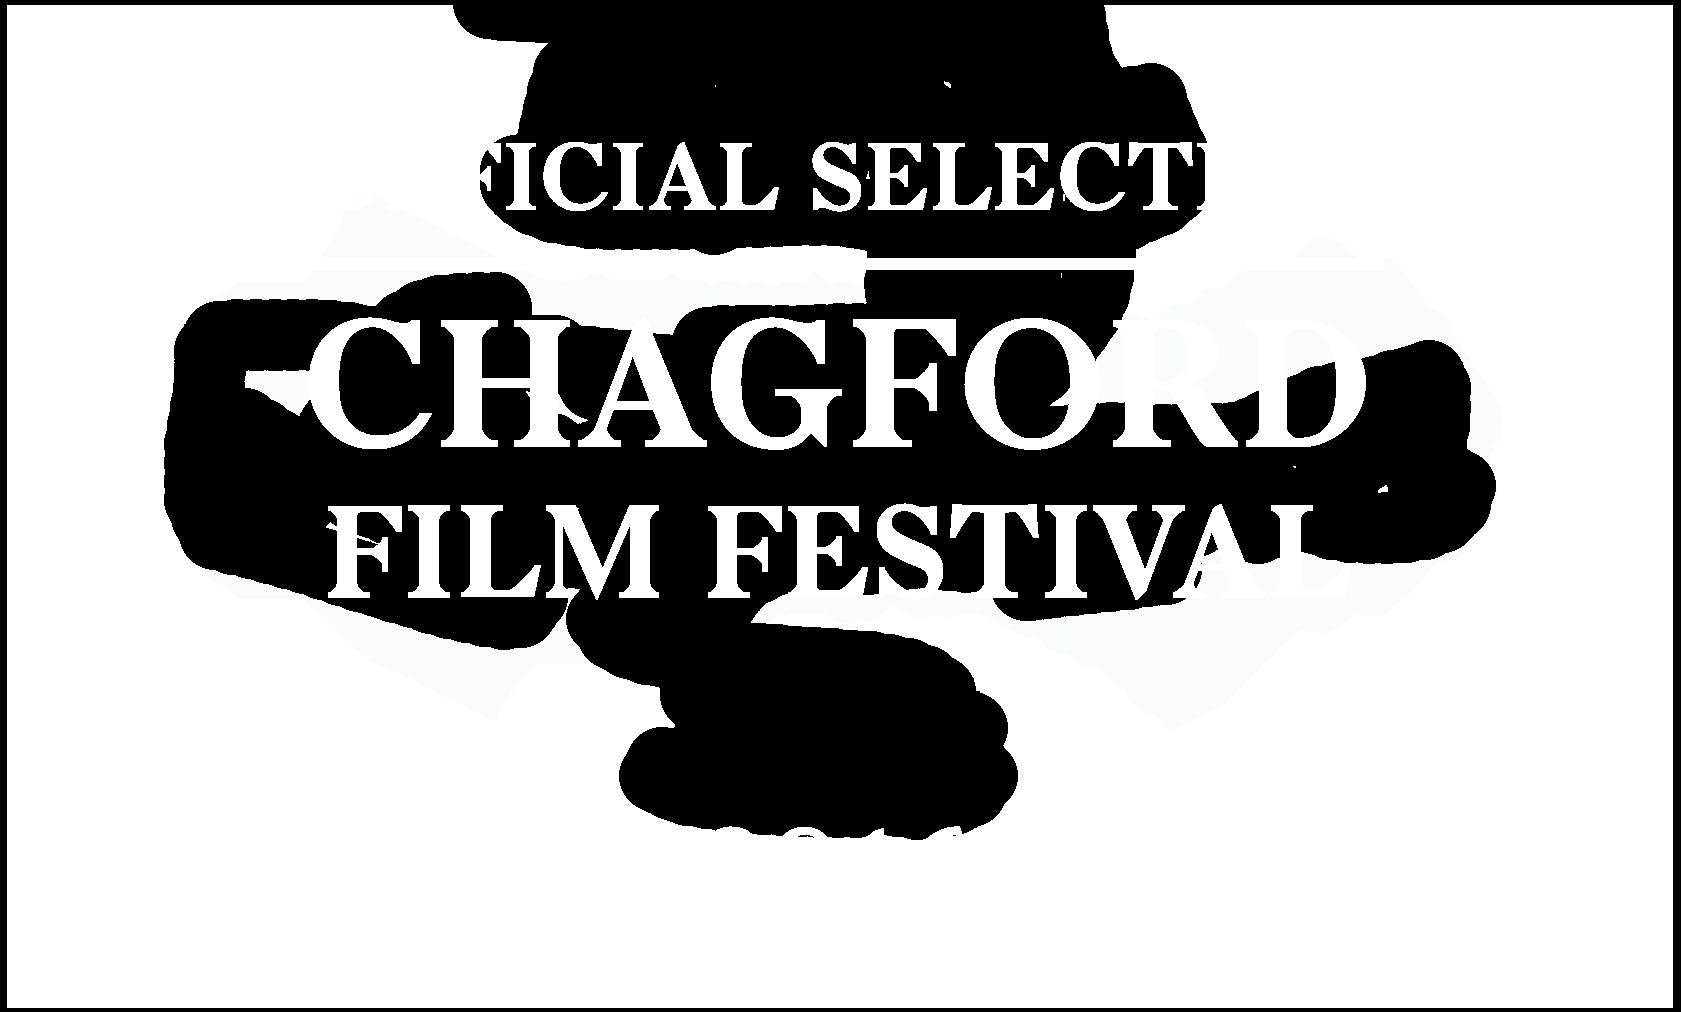 Laurel_ChagfordOfficialSelectionFinal_w.png